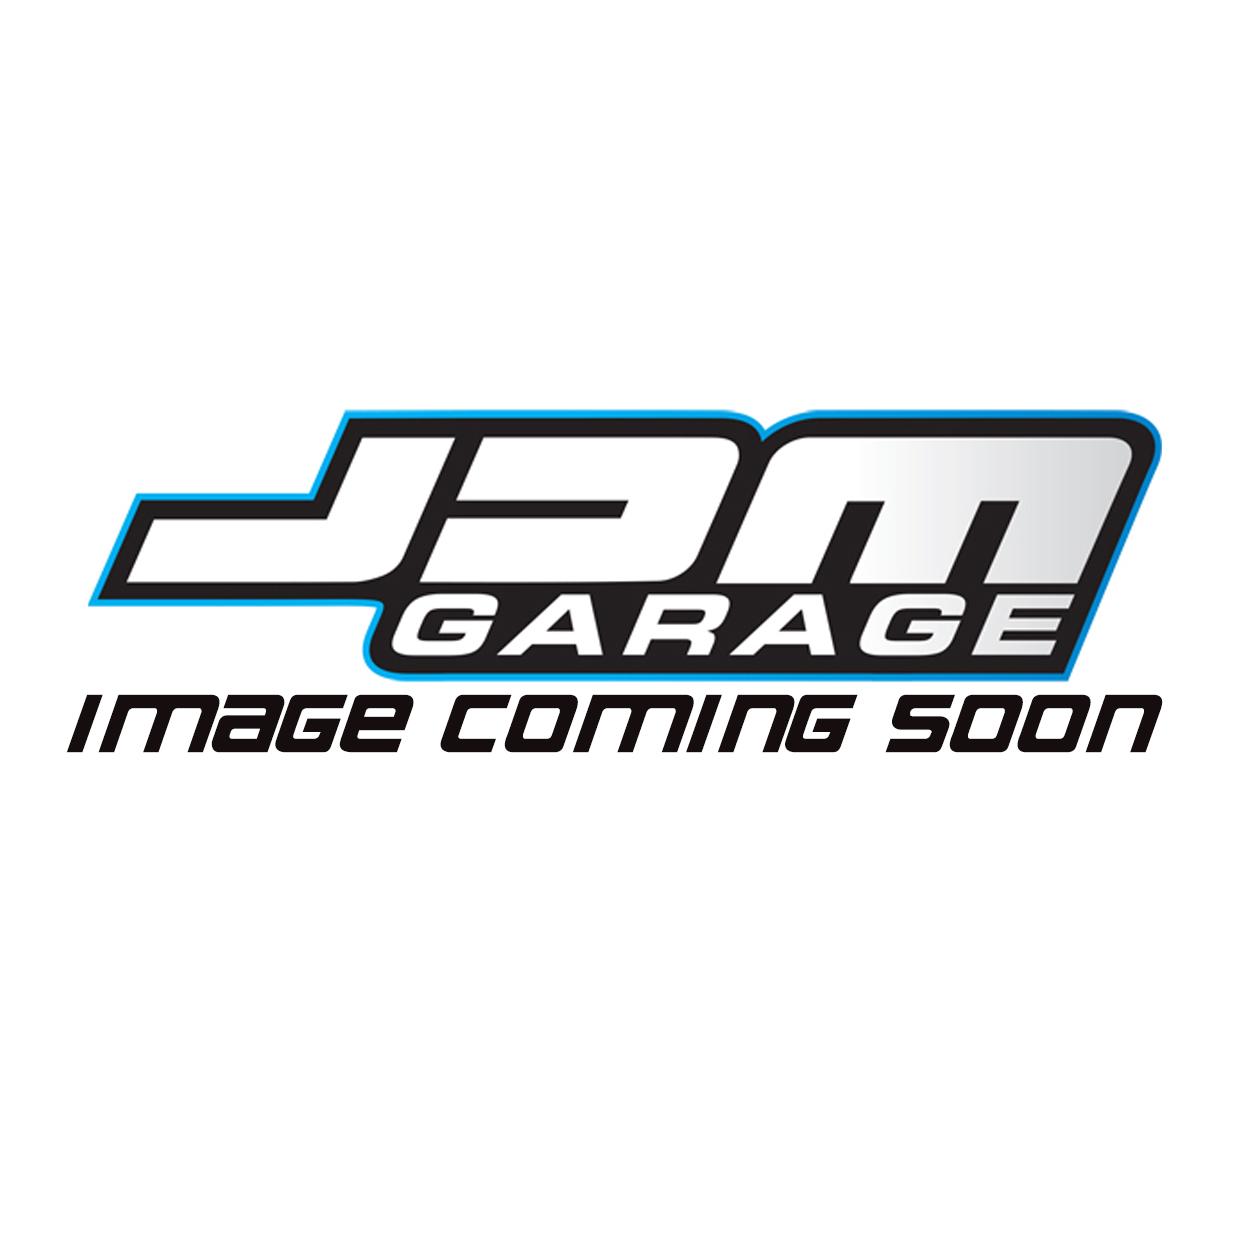 Siruda Exhaust Manifold Head Studs And MLS Gasket - Nissan Skyline R32 GTST / R33 GTST / R34 GTT / Laurel C32 / C33 / C34 / C35 / Stagea / Cefiro A31 RB20DET RB25DET